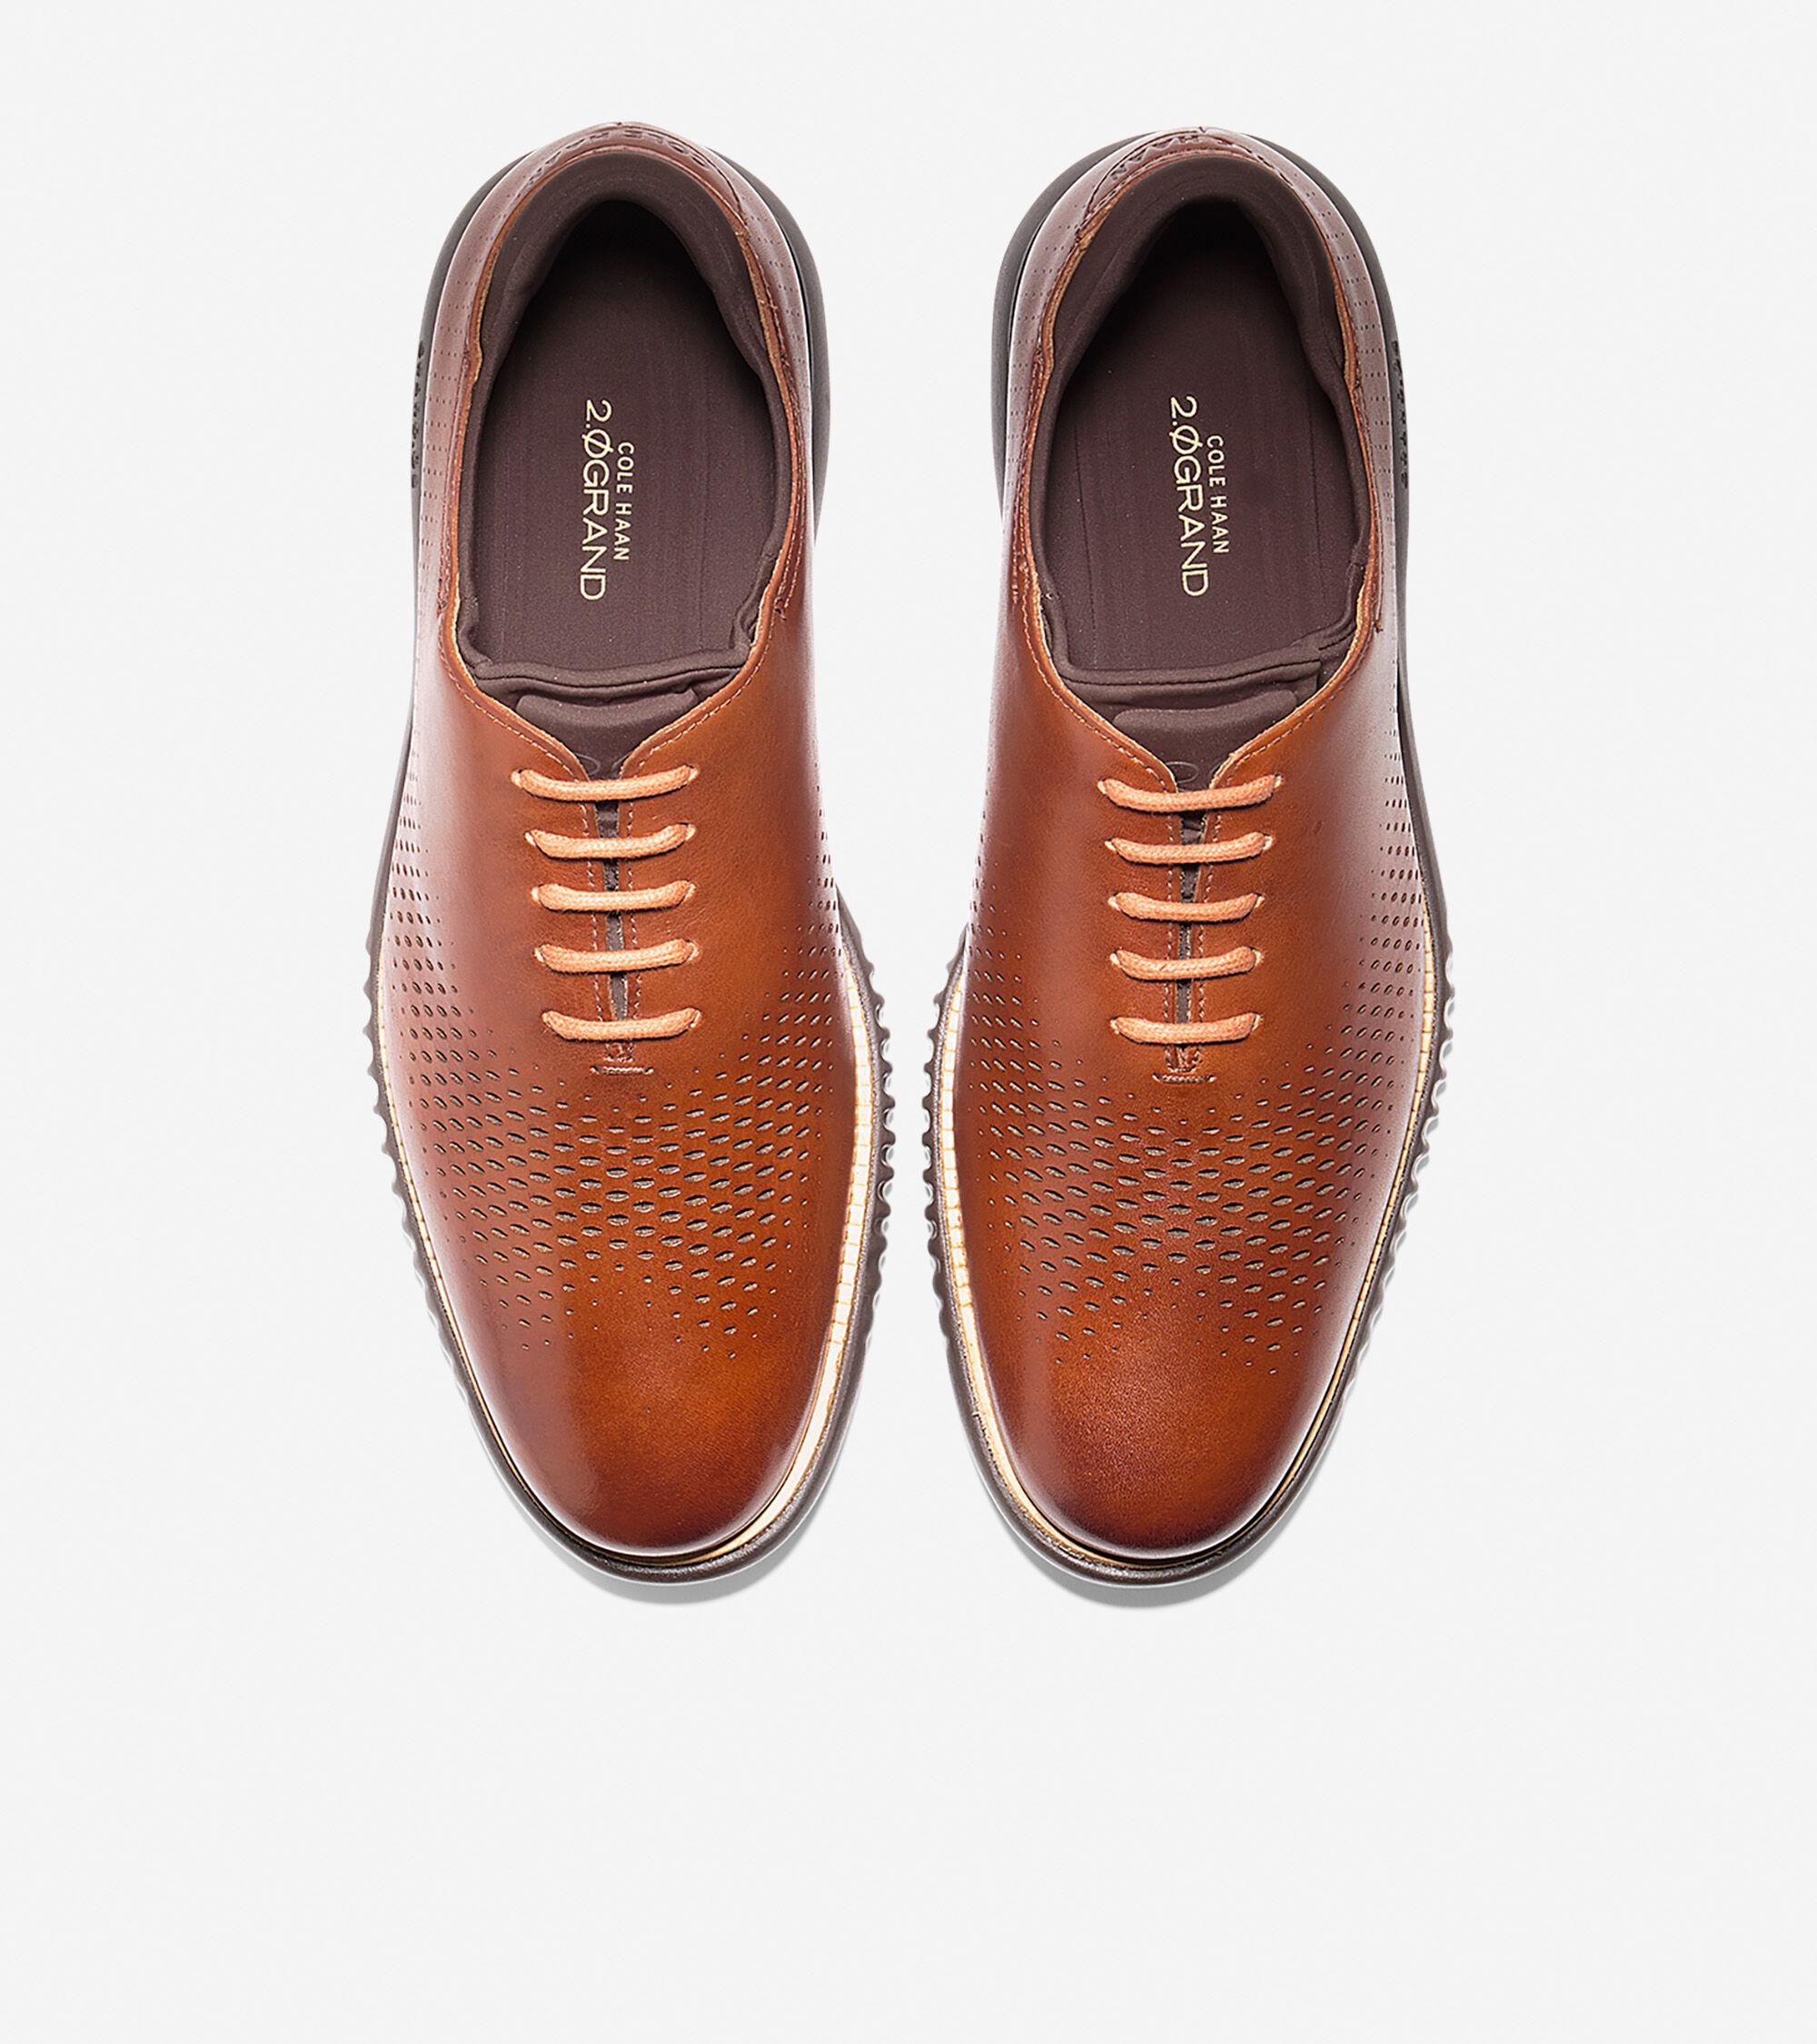 cole haan shoes defective products lawsuits against doctors 7098